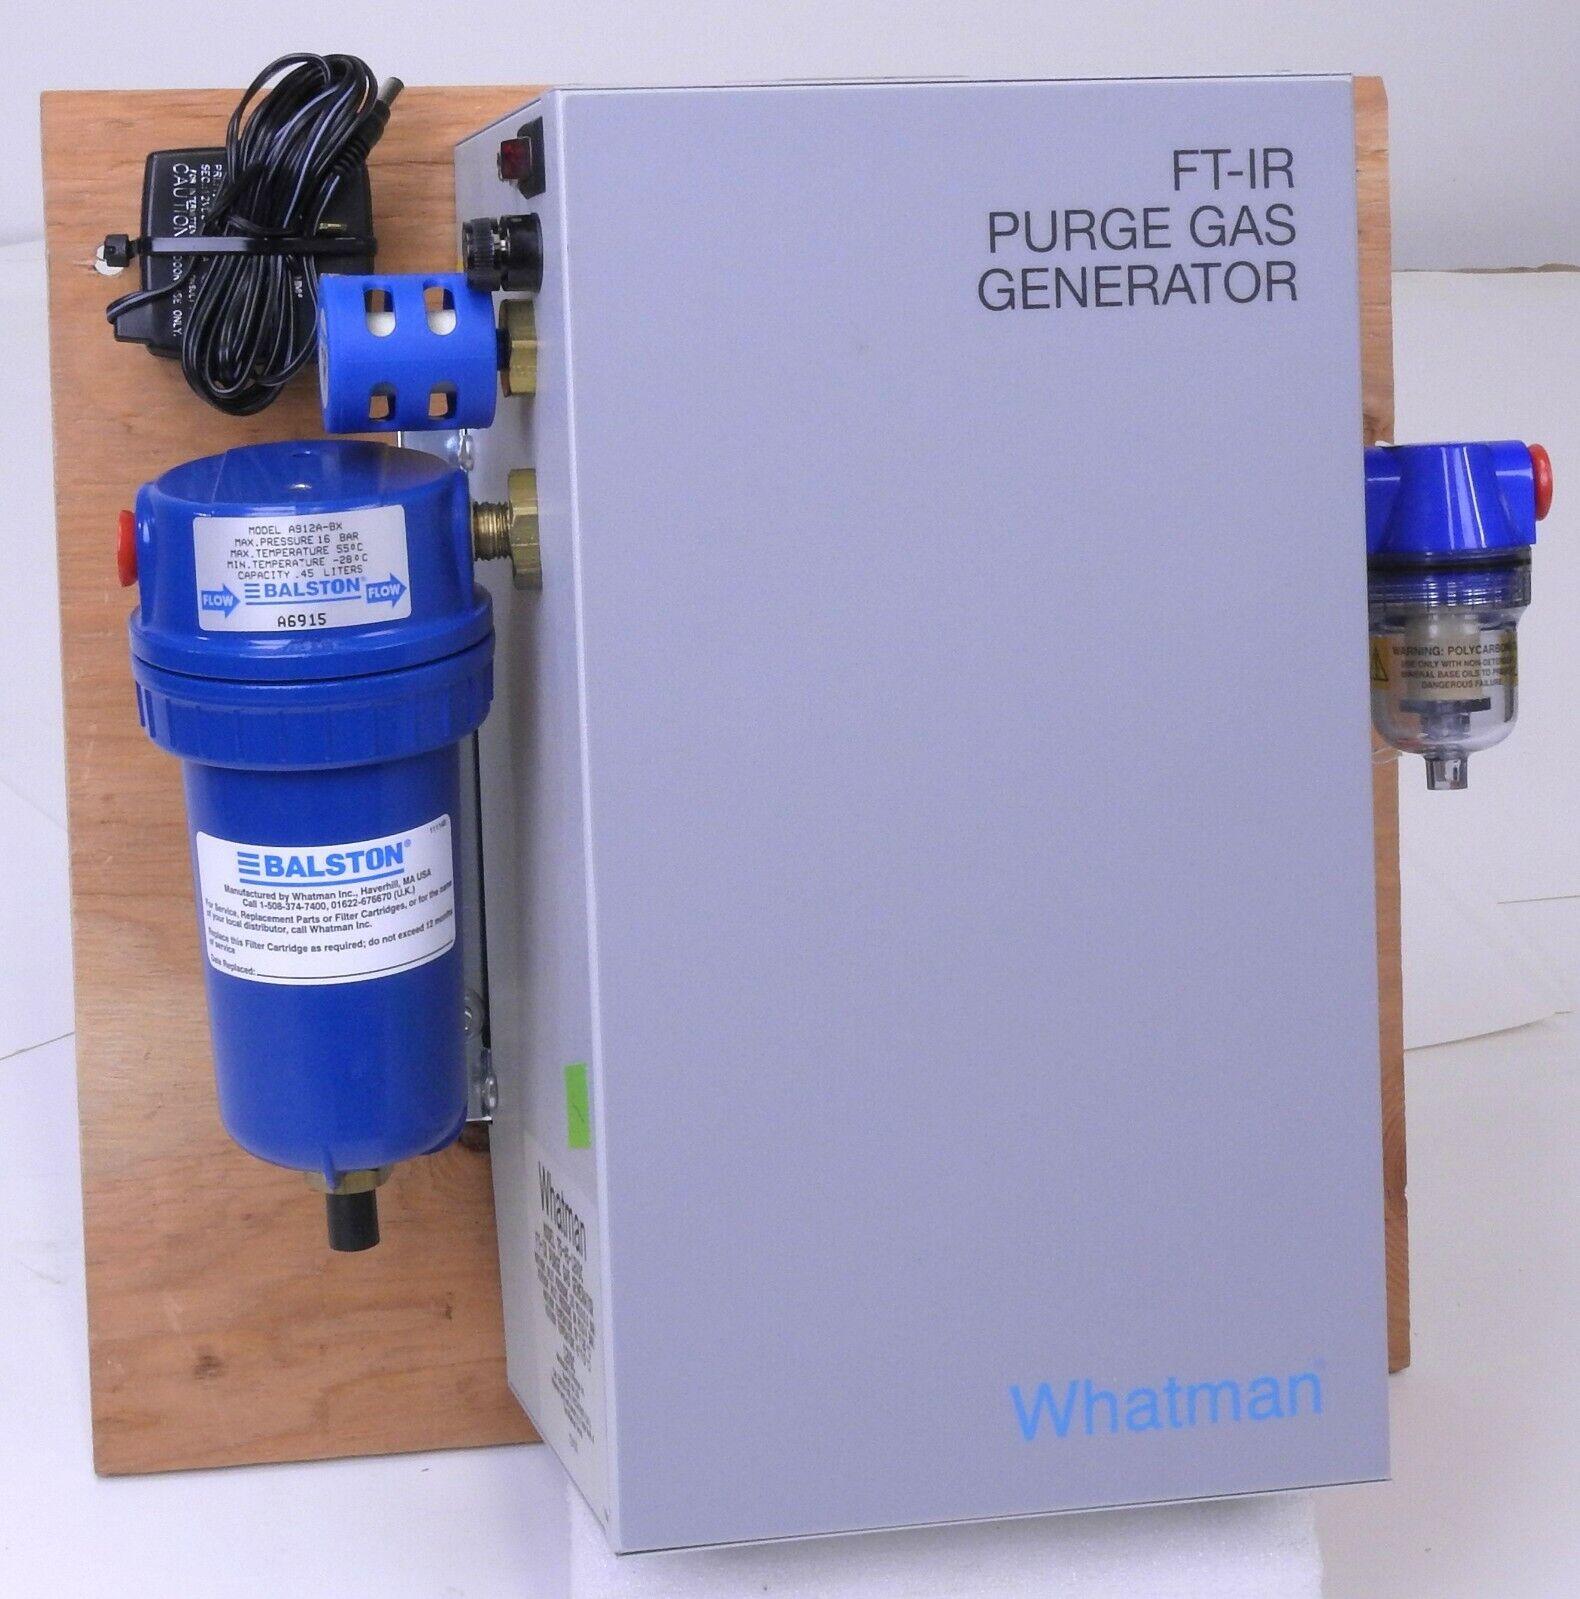 Whatman (Parker Balston) 75-45 -12VDC FT-IR